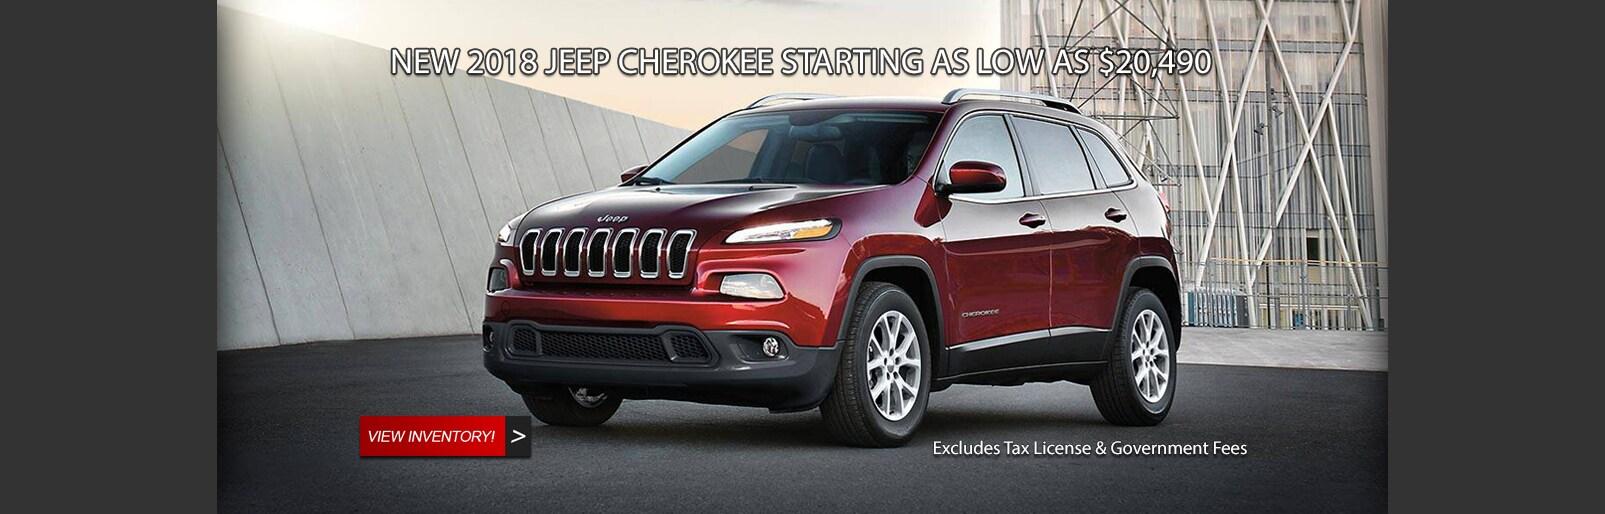 New and Used Dodge Chrysler Jeep Ram | Cerritos Dodge